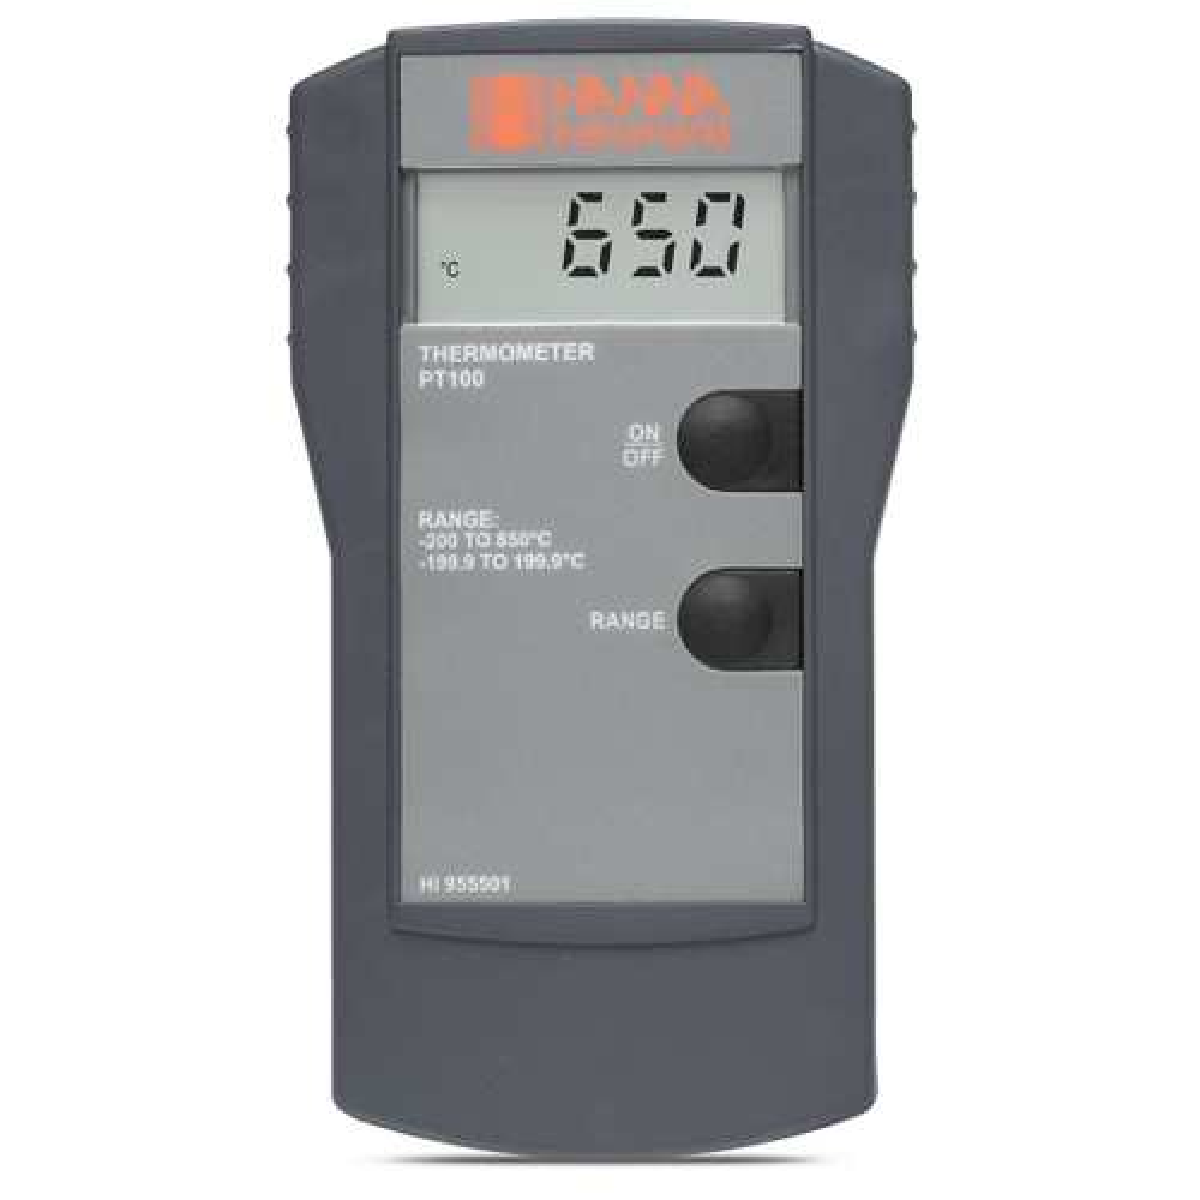 HI955501 - Termometro Pt100